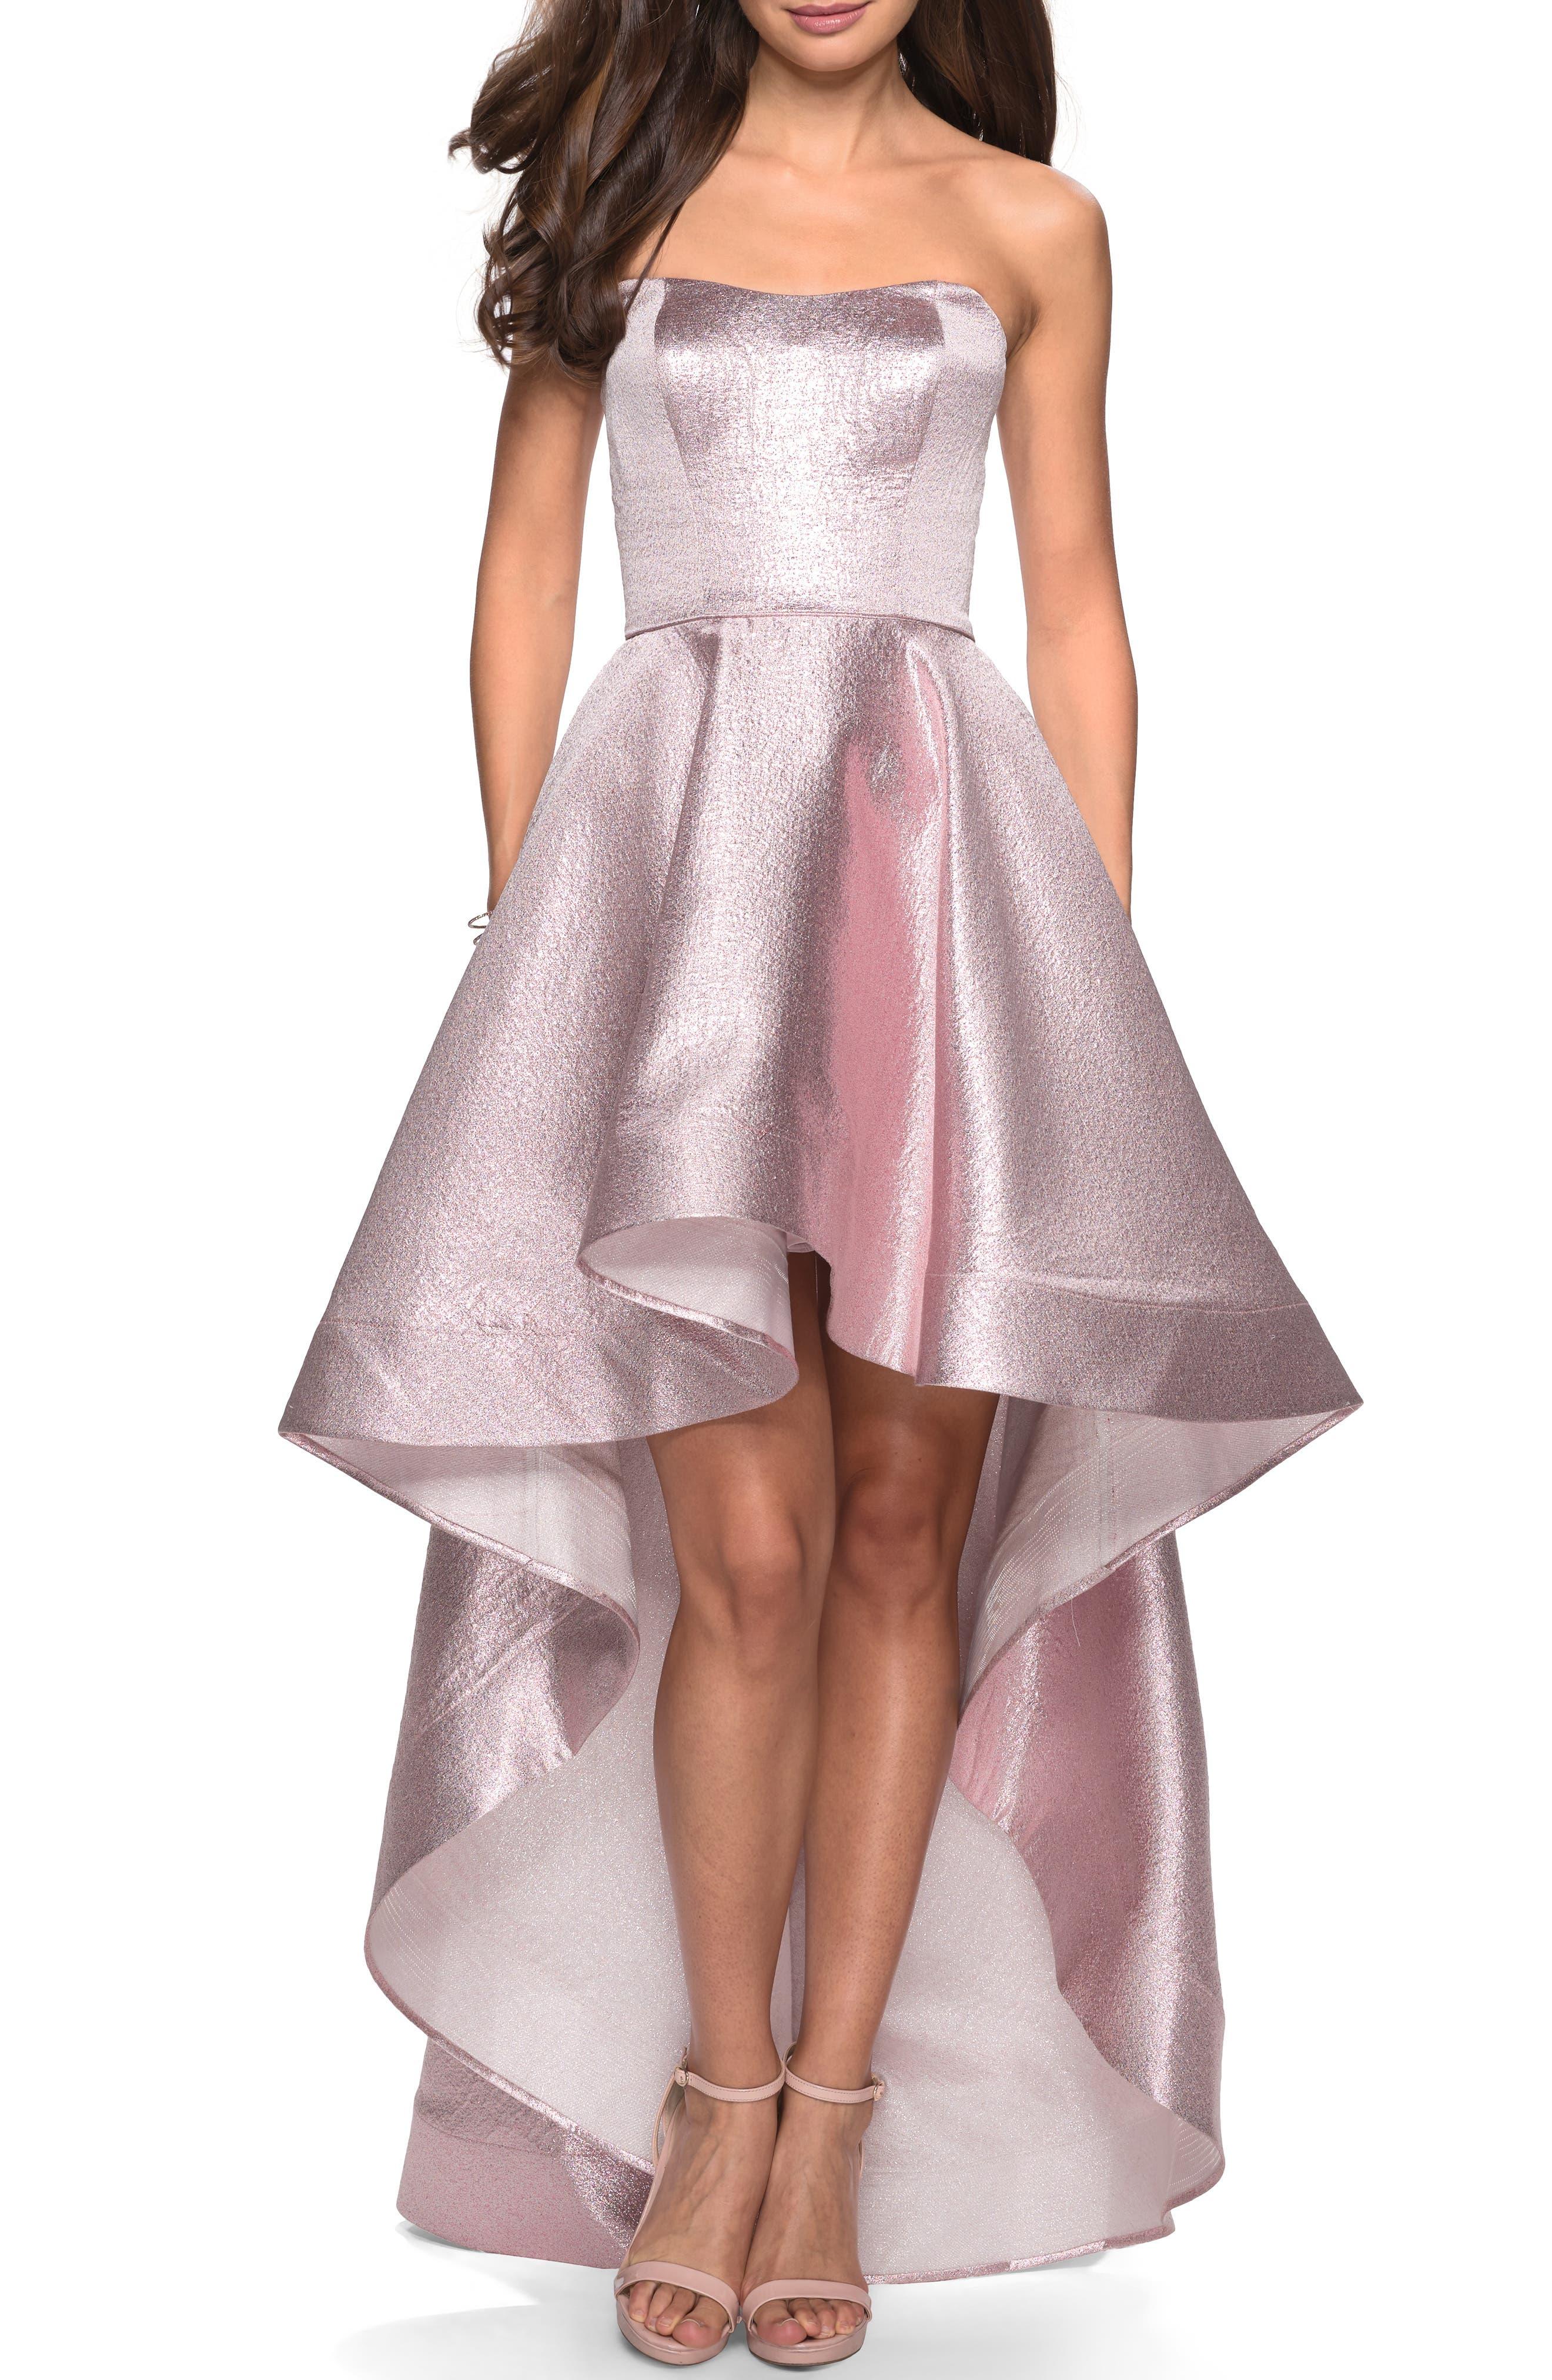 La Femme Strapless High/low Evening Dress, Pink